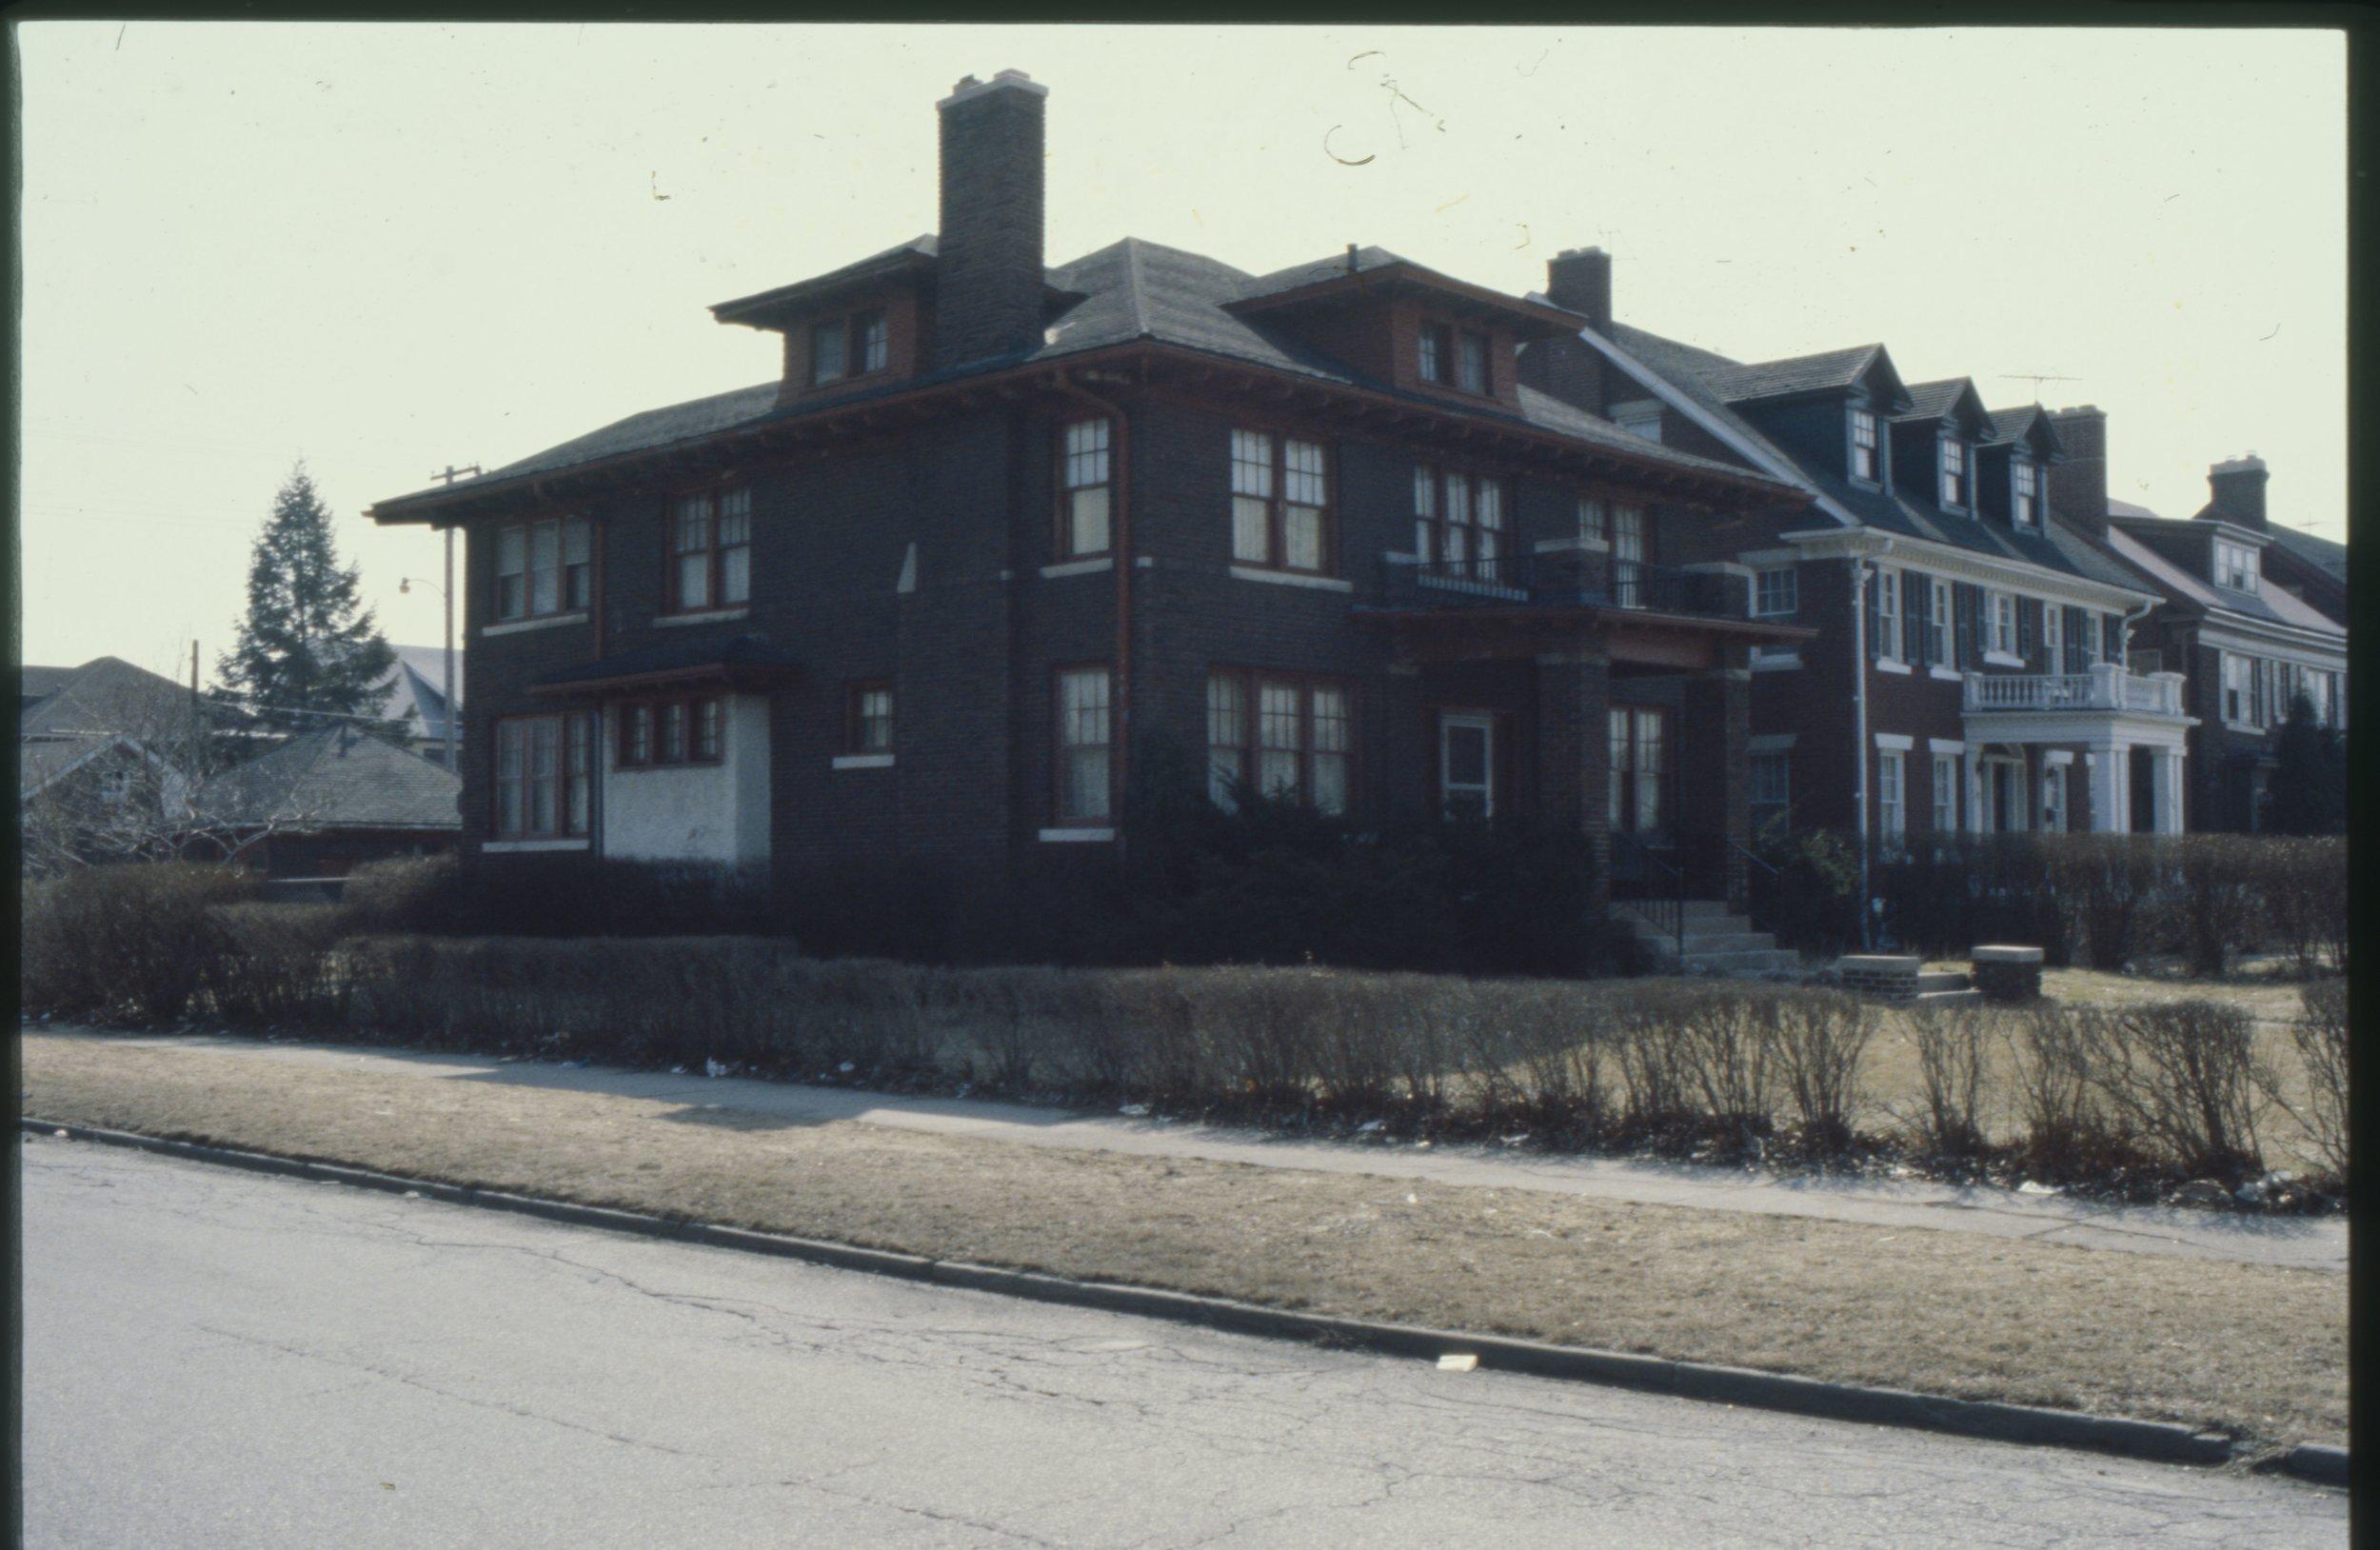 1605 W. Boston 1980_2.jpg